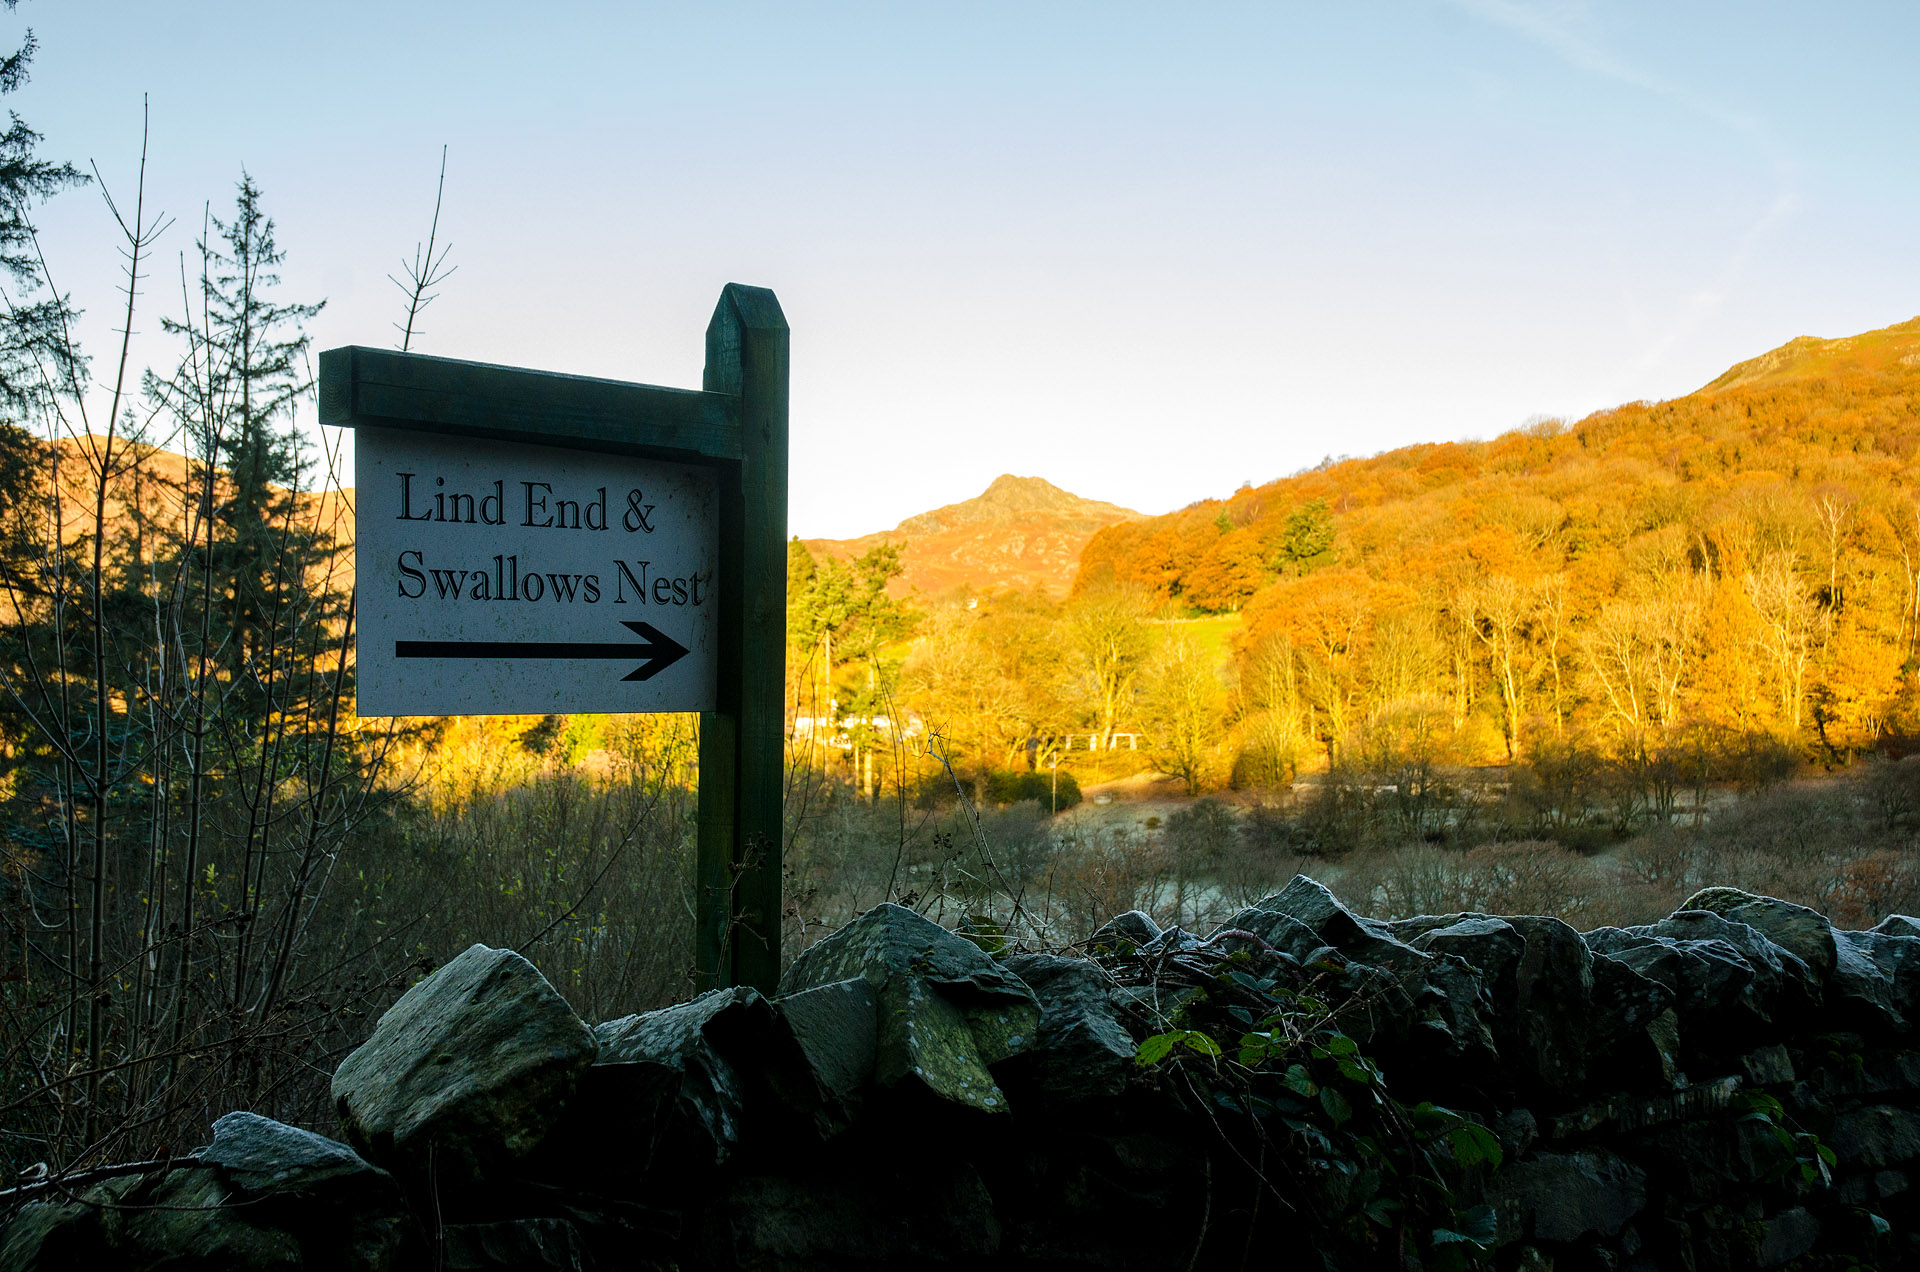 Lind End Farm